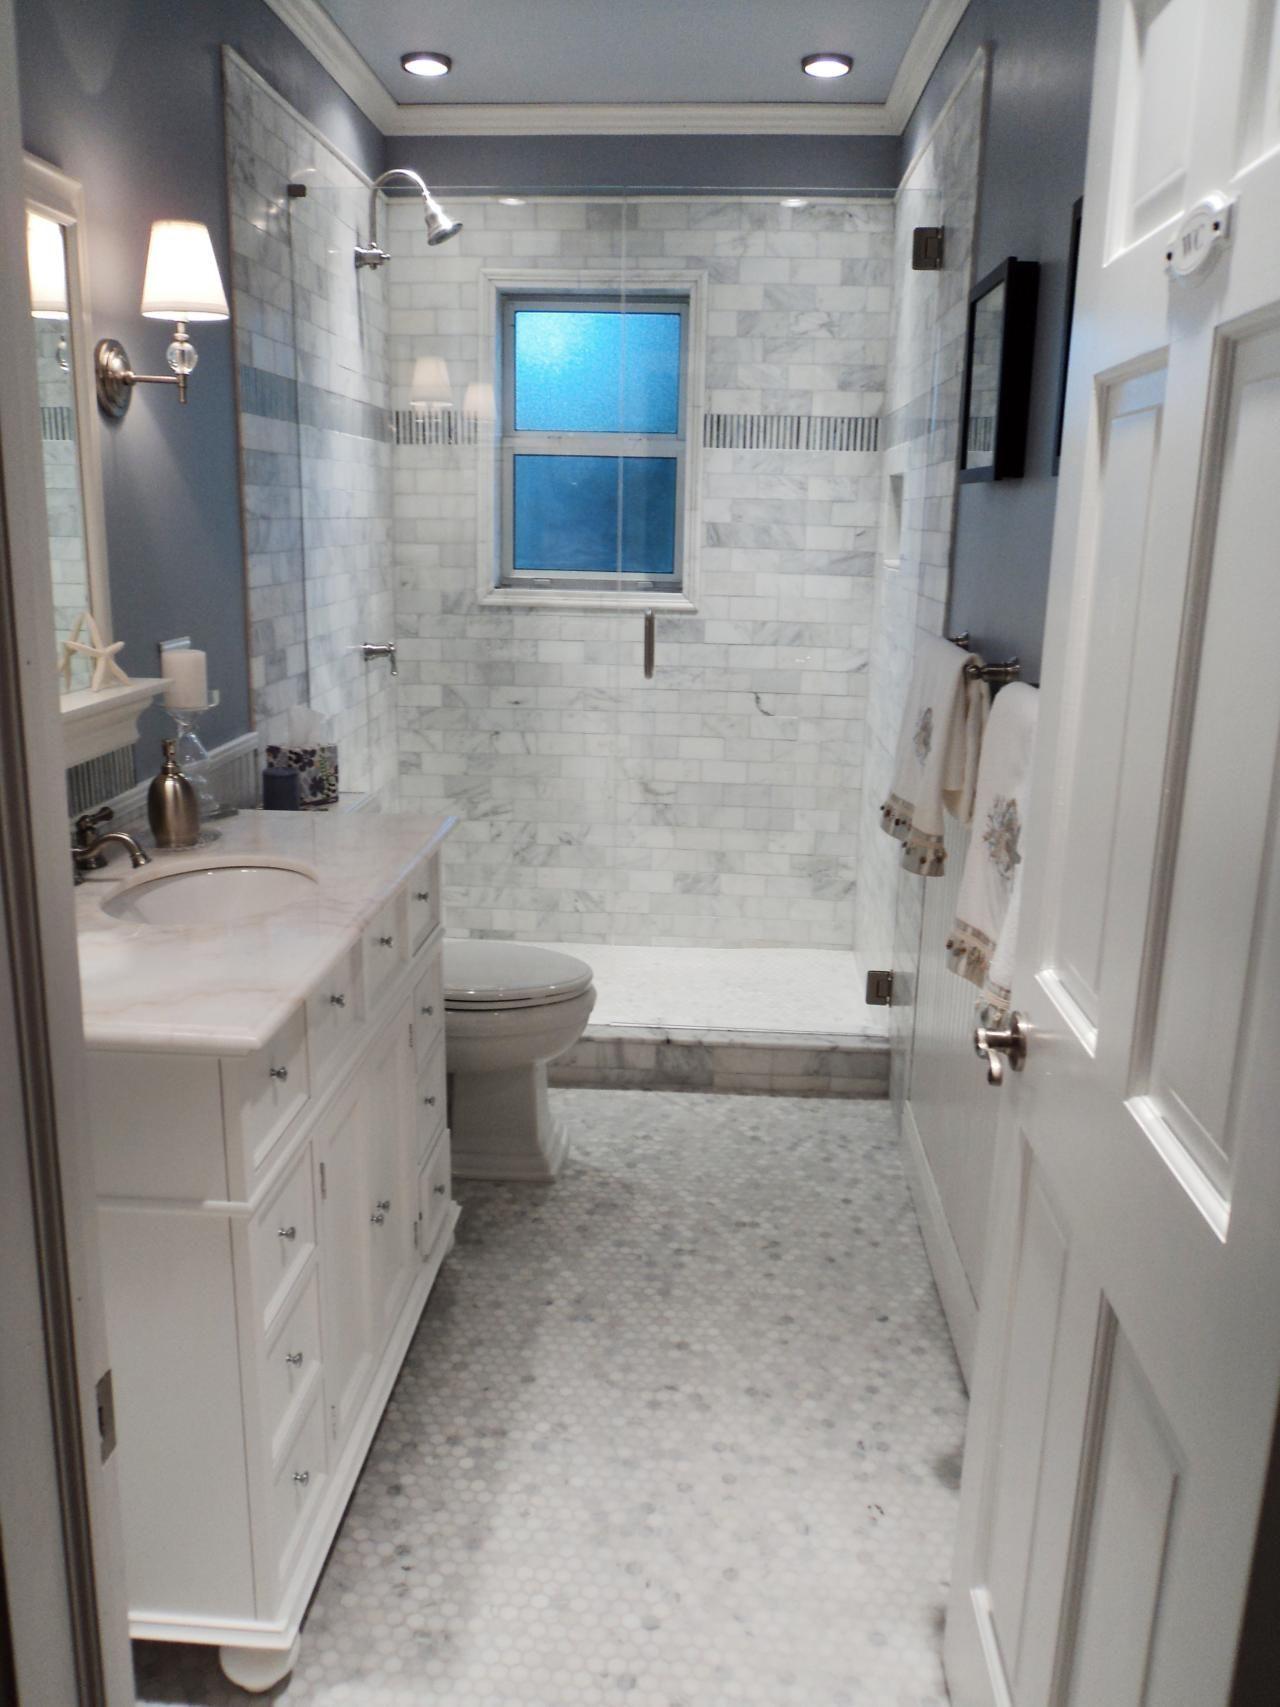 Stylish Bathroom Updates Bathroom Ideas Design With Vanities Tile Cabinets Sinks Hgtv Stylish Bathroom Small Master Bathroom Bathroom Remodel Master